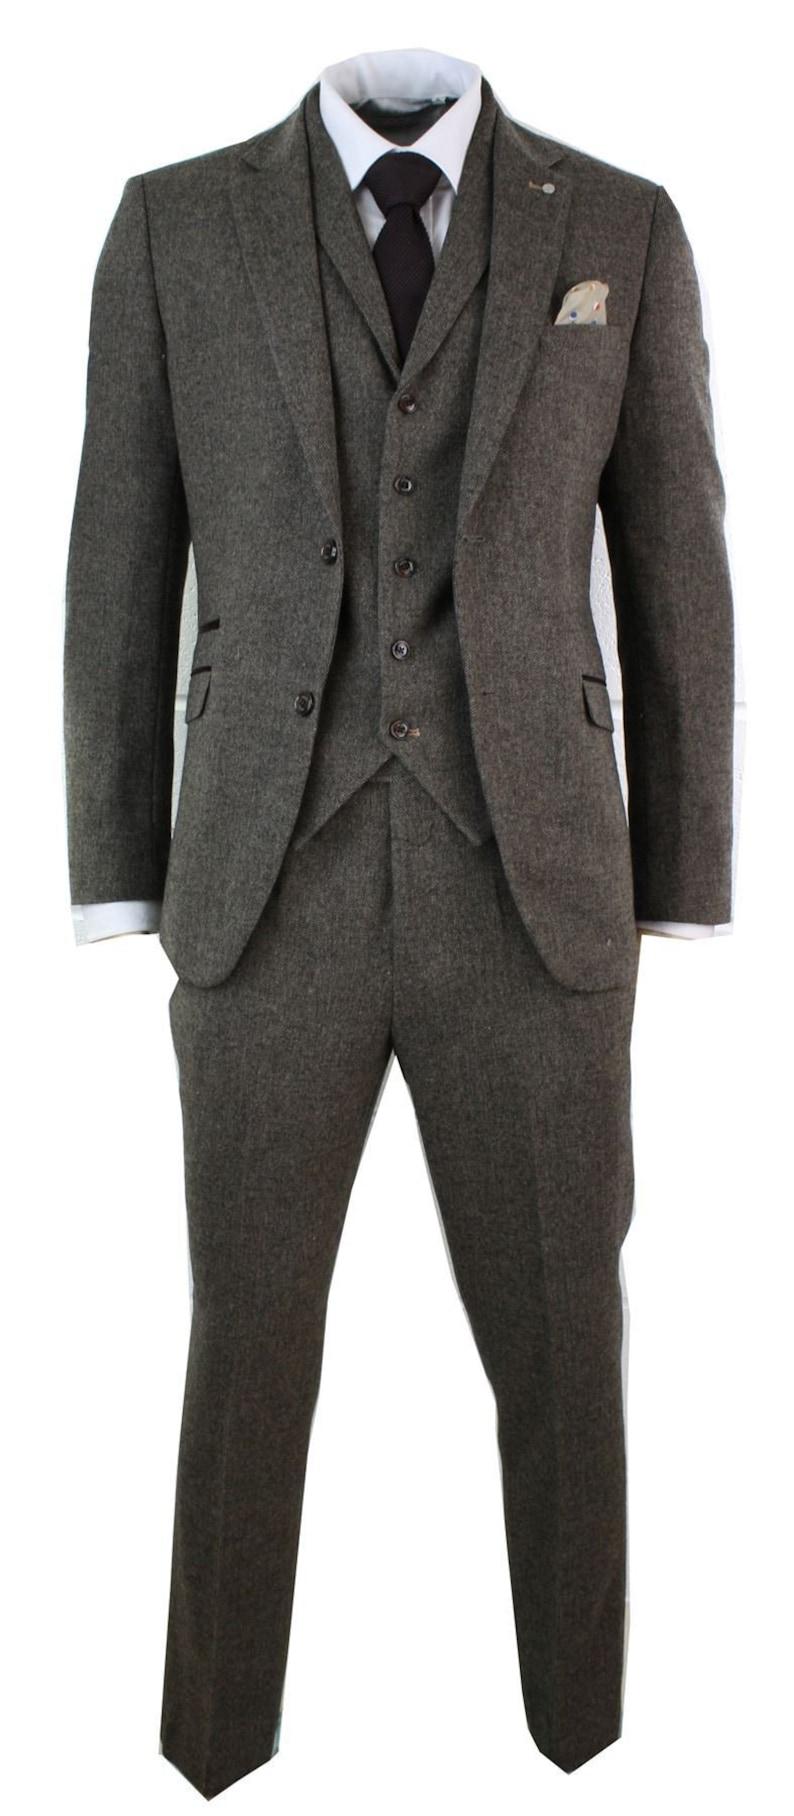 Men's Vintage Clothing | Retro Clothing for Men     Mens 3 piece wool blend herringbone tweed suit blue brown vintage tailored fit $288.52 AT vintagedancer.com